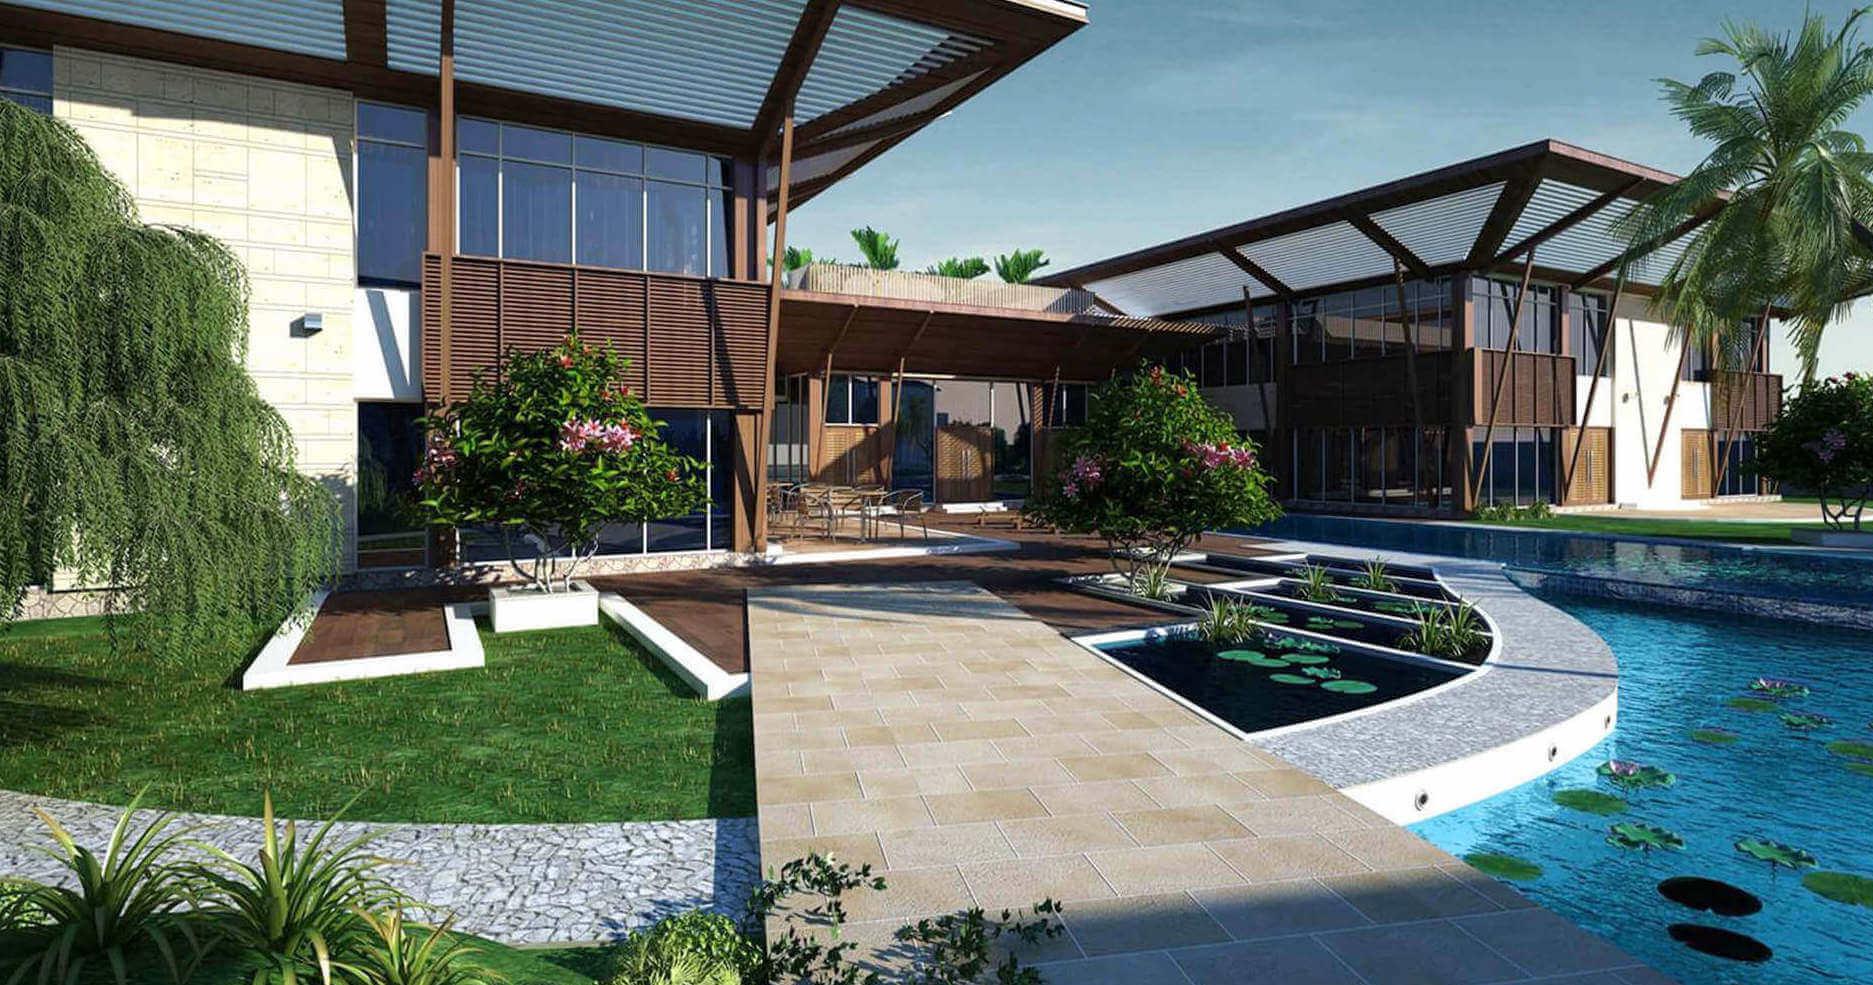 Alakananda RiverFront - Clubhouse